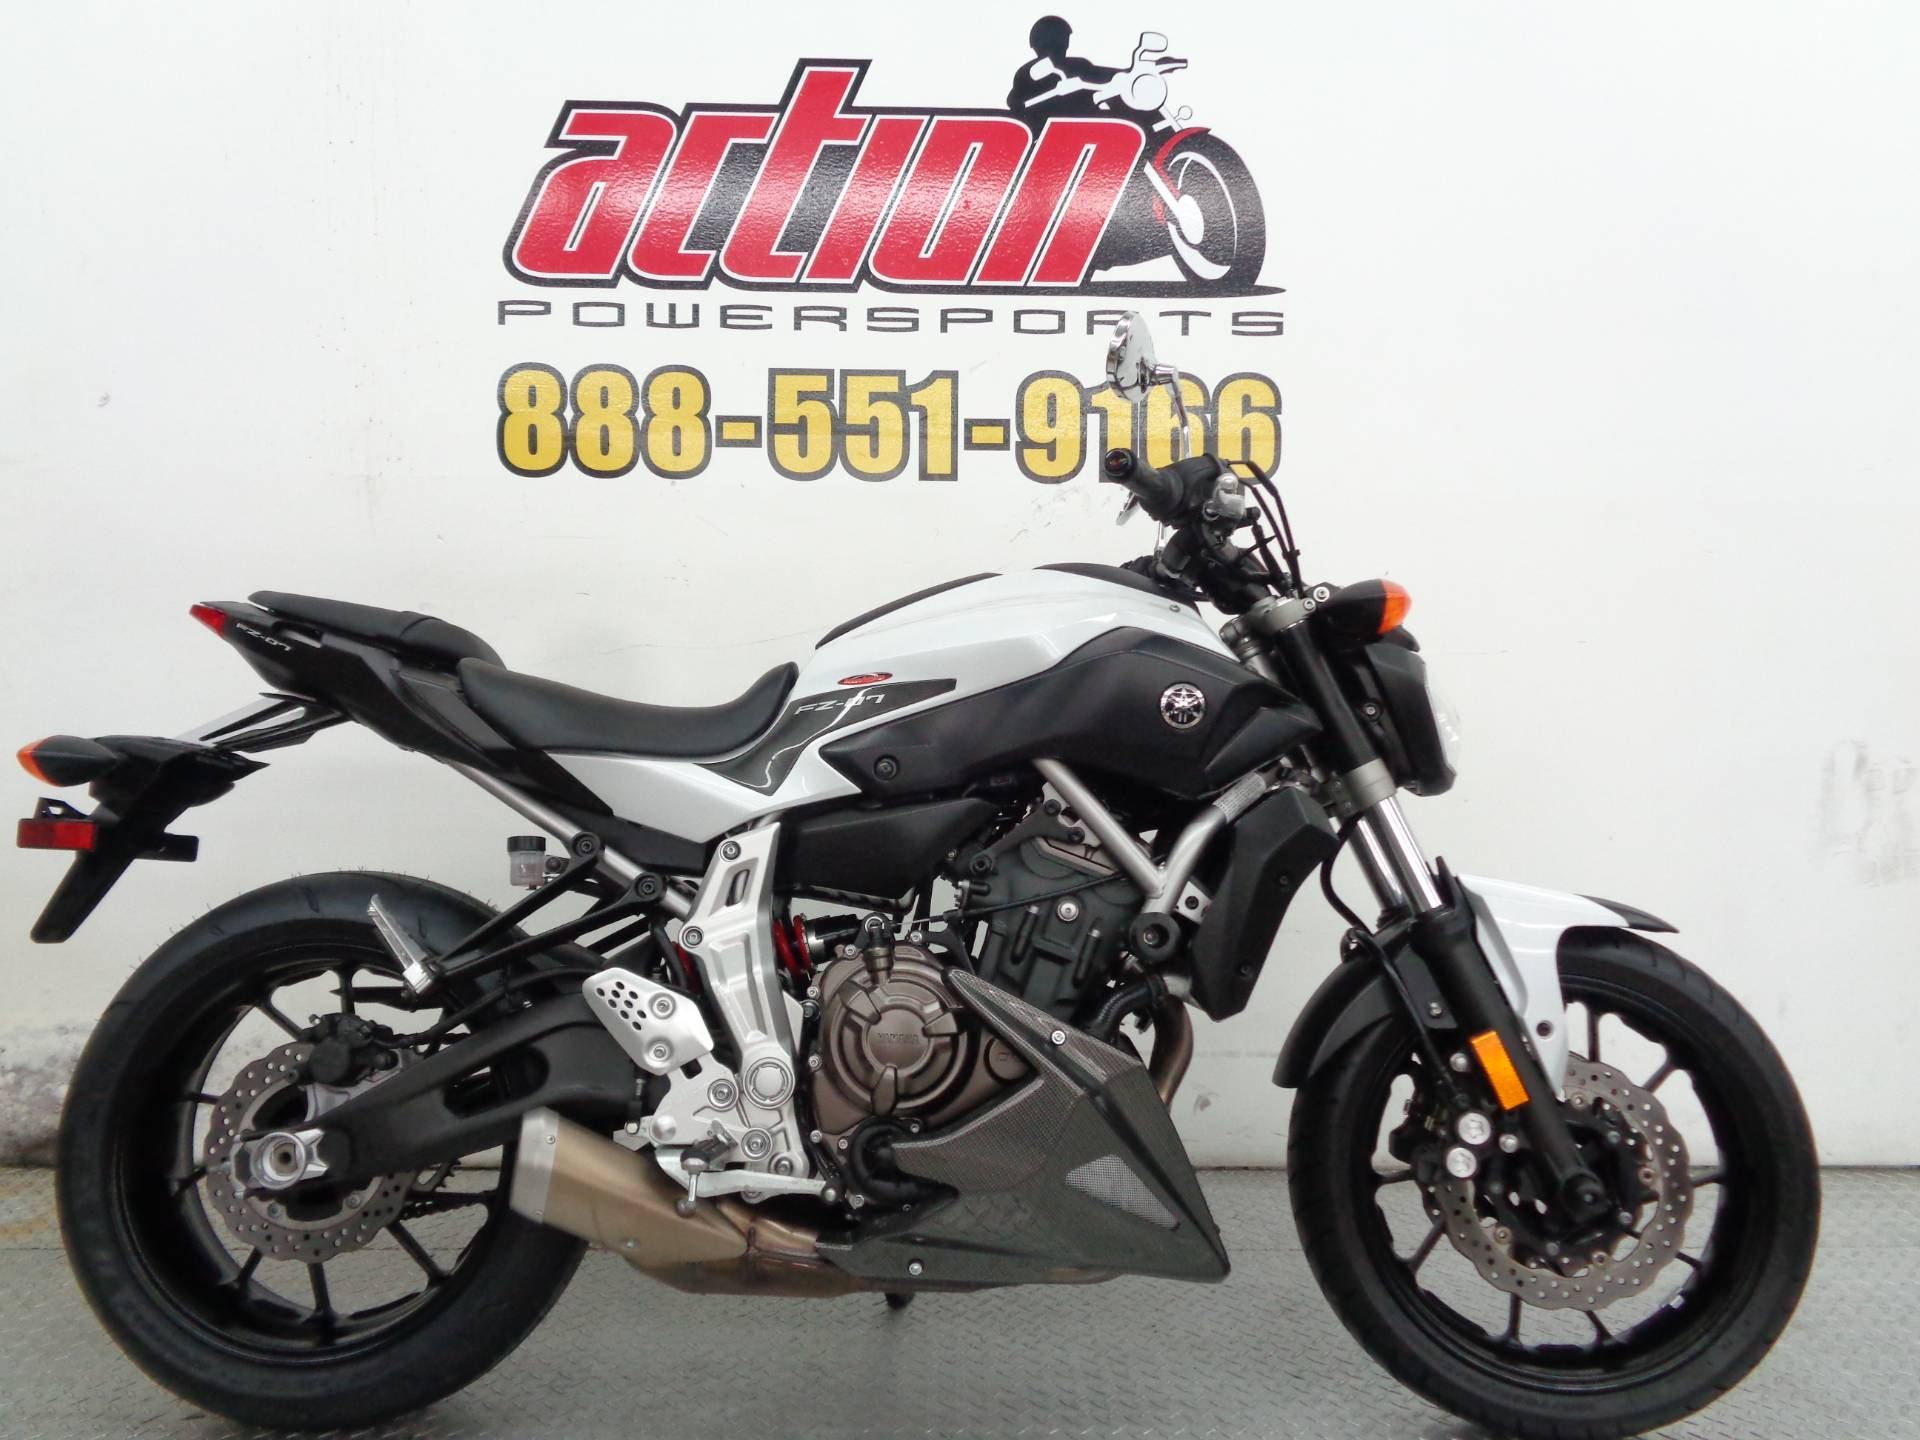 2015 Yamaha FZ-07 for sale 57971